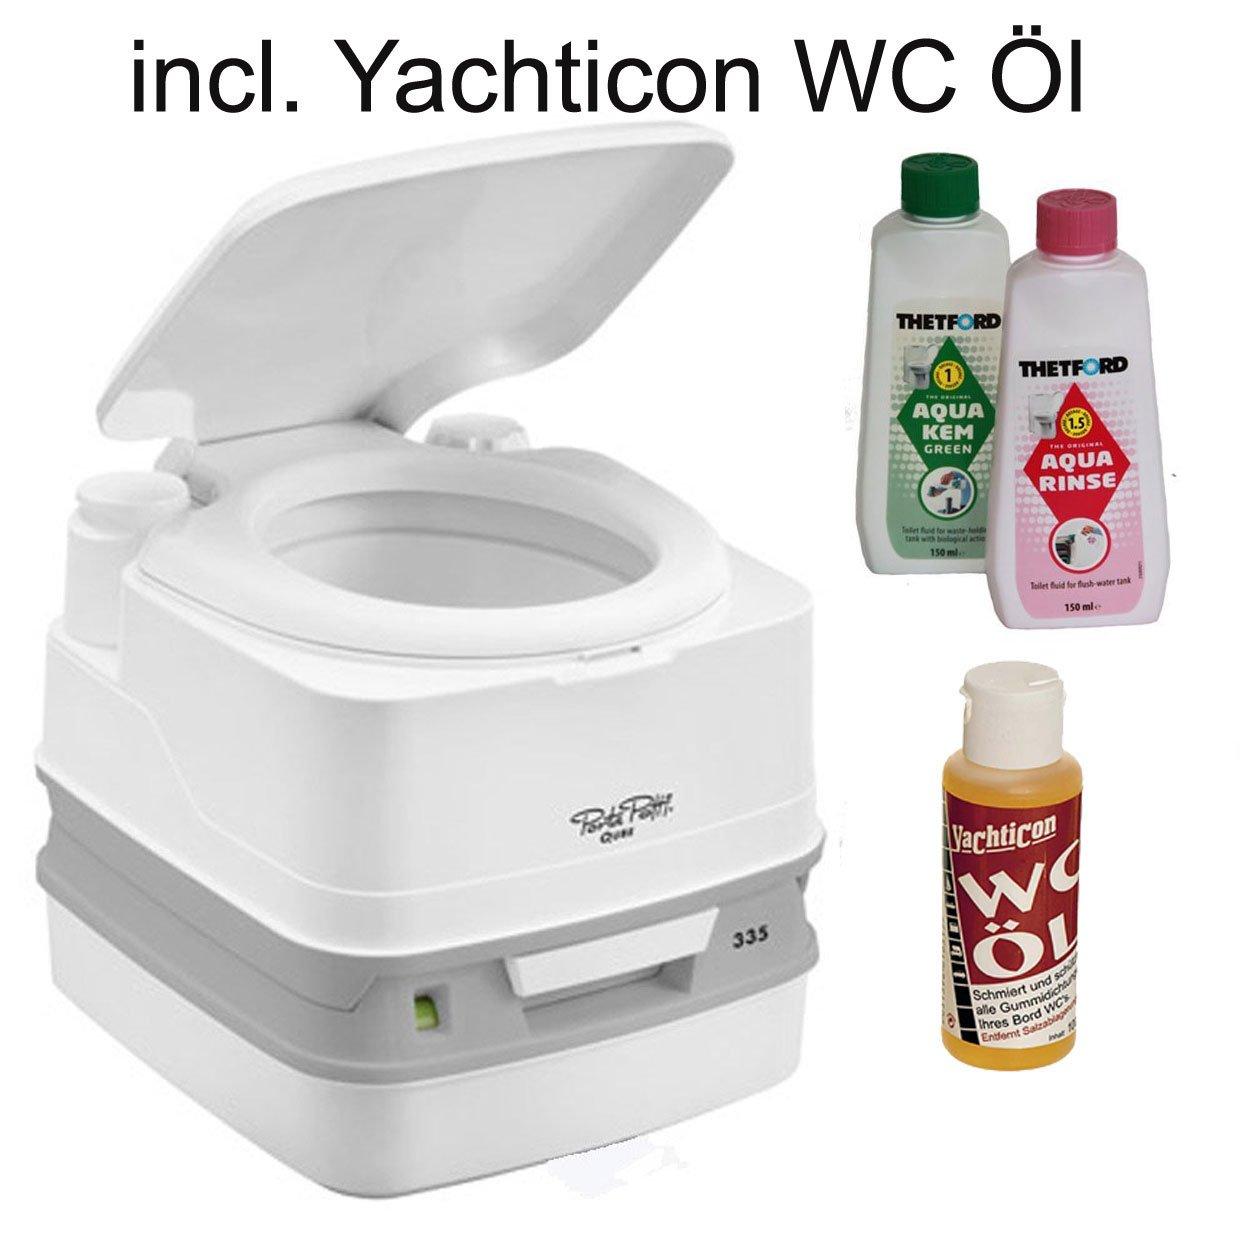 Thetford Tragbare Frischwassertoilette Porta Potti PP 335 bootsshop Edition incl. Yachticon WC Öl